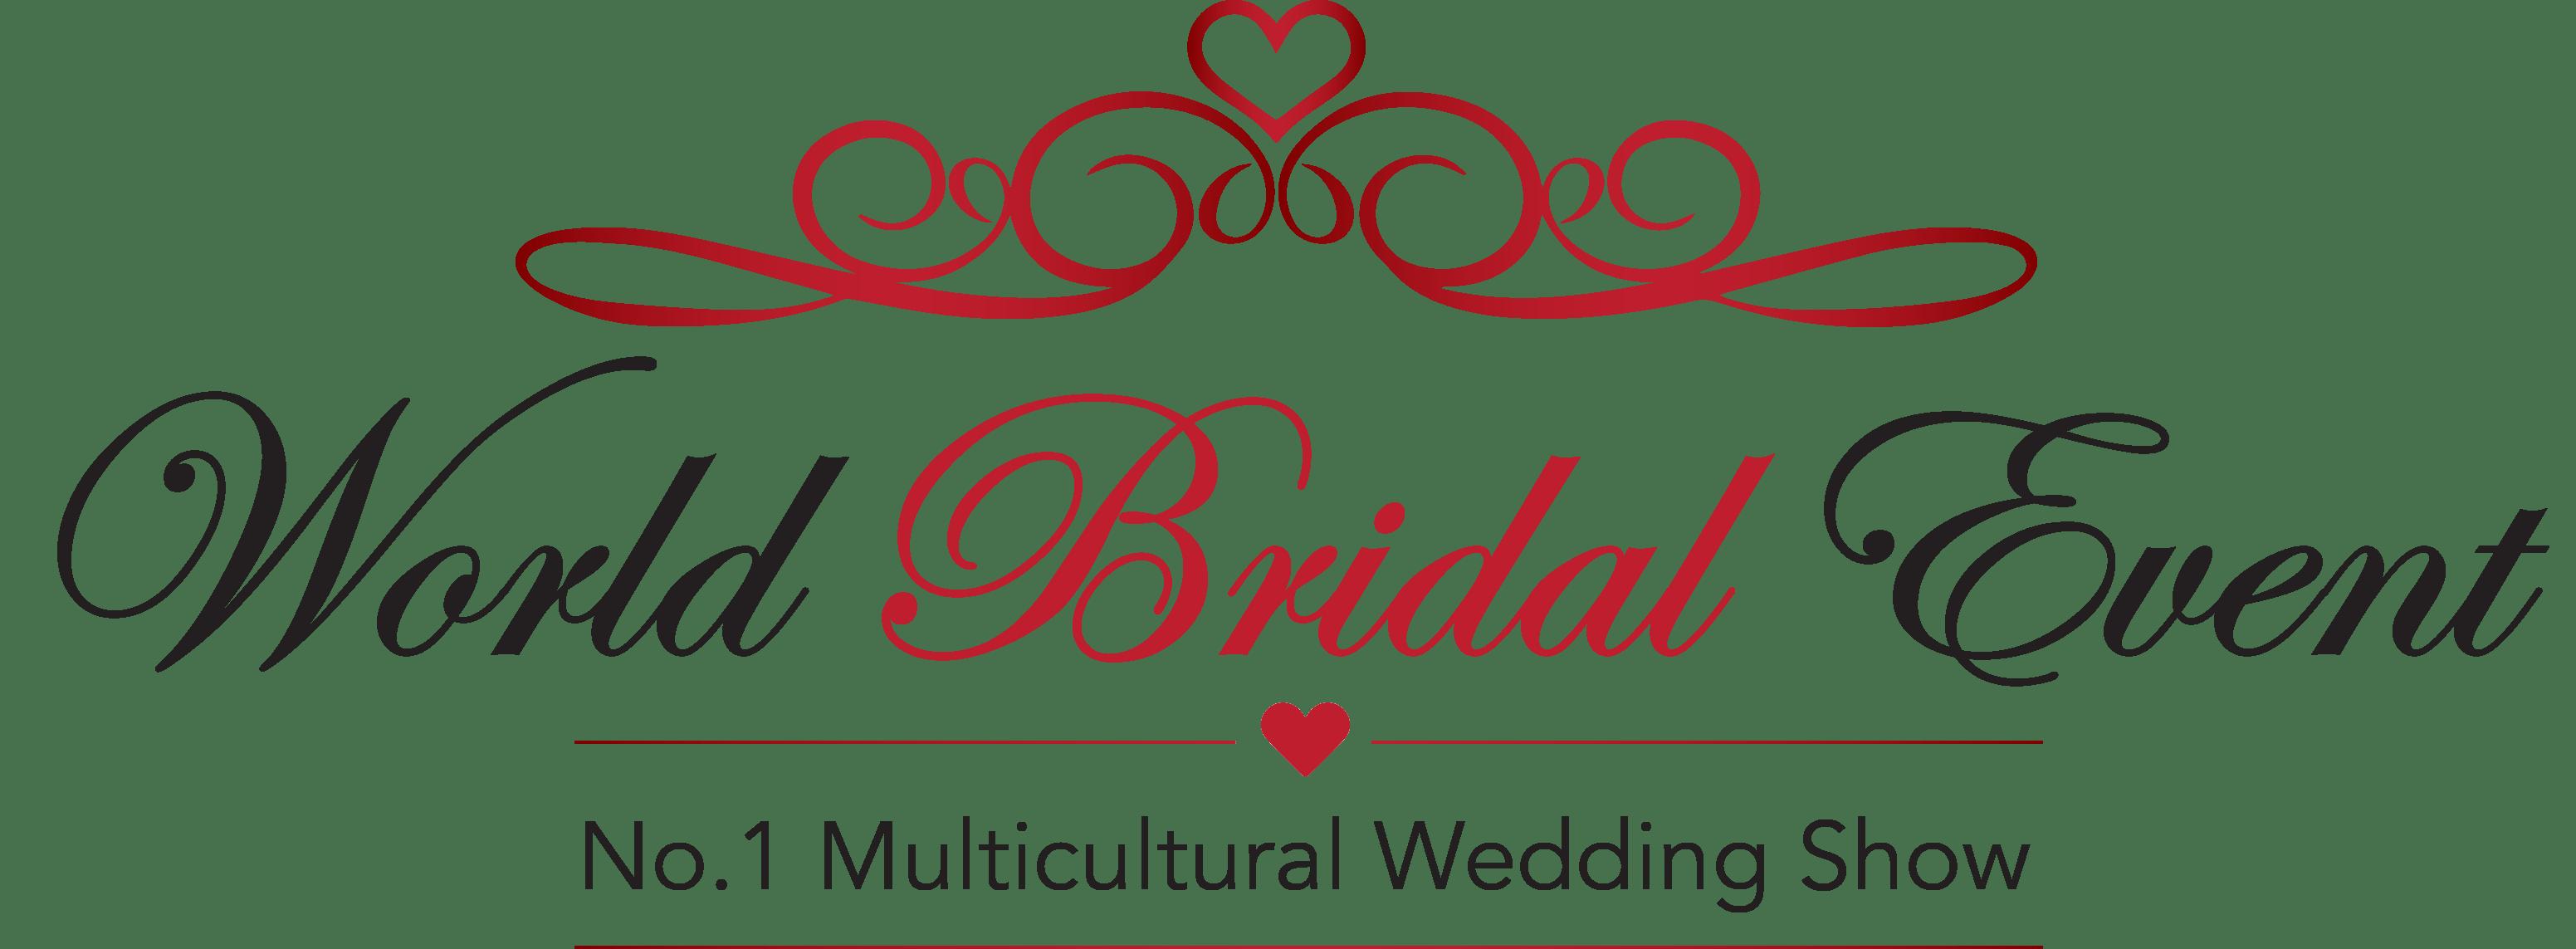 World Bridal Event- Yorkshire- Multi Cultural Wedding- Venue Styling- Sophias Final Touch